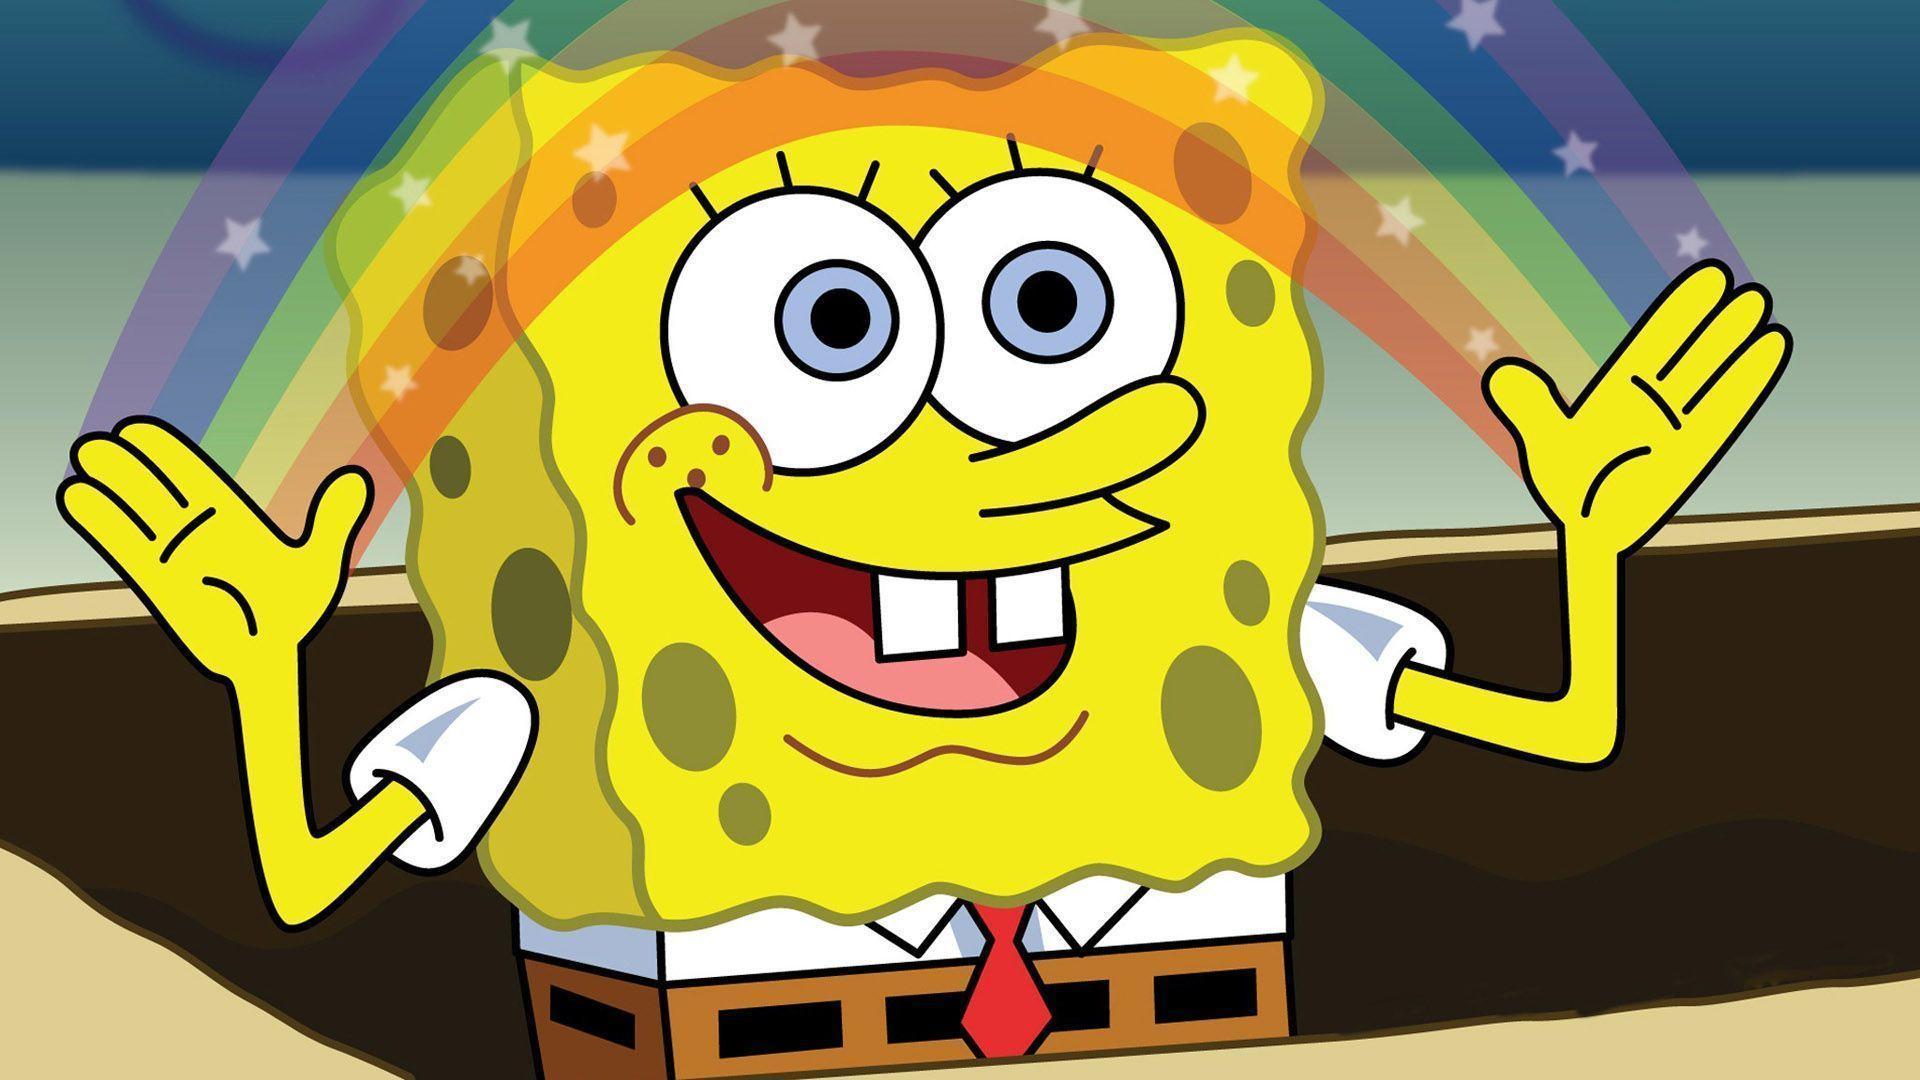 Cool Spongebob Wallpaper Picture designs For Your Walls